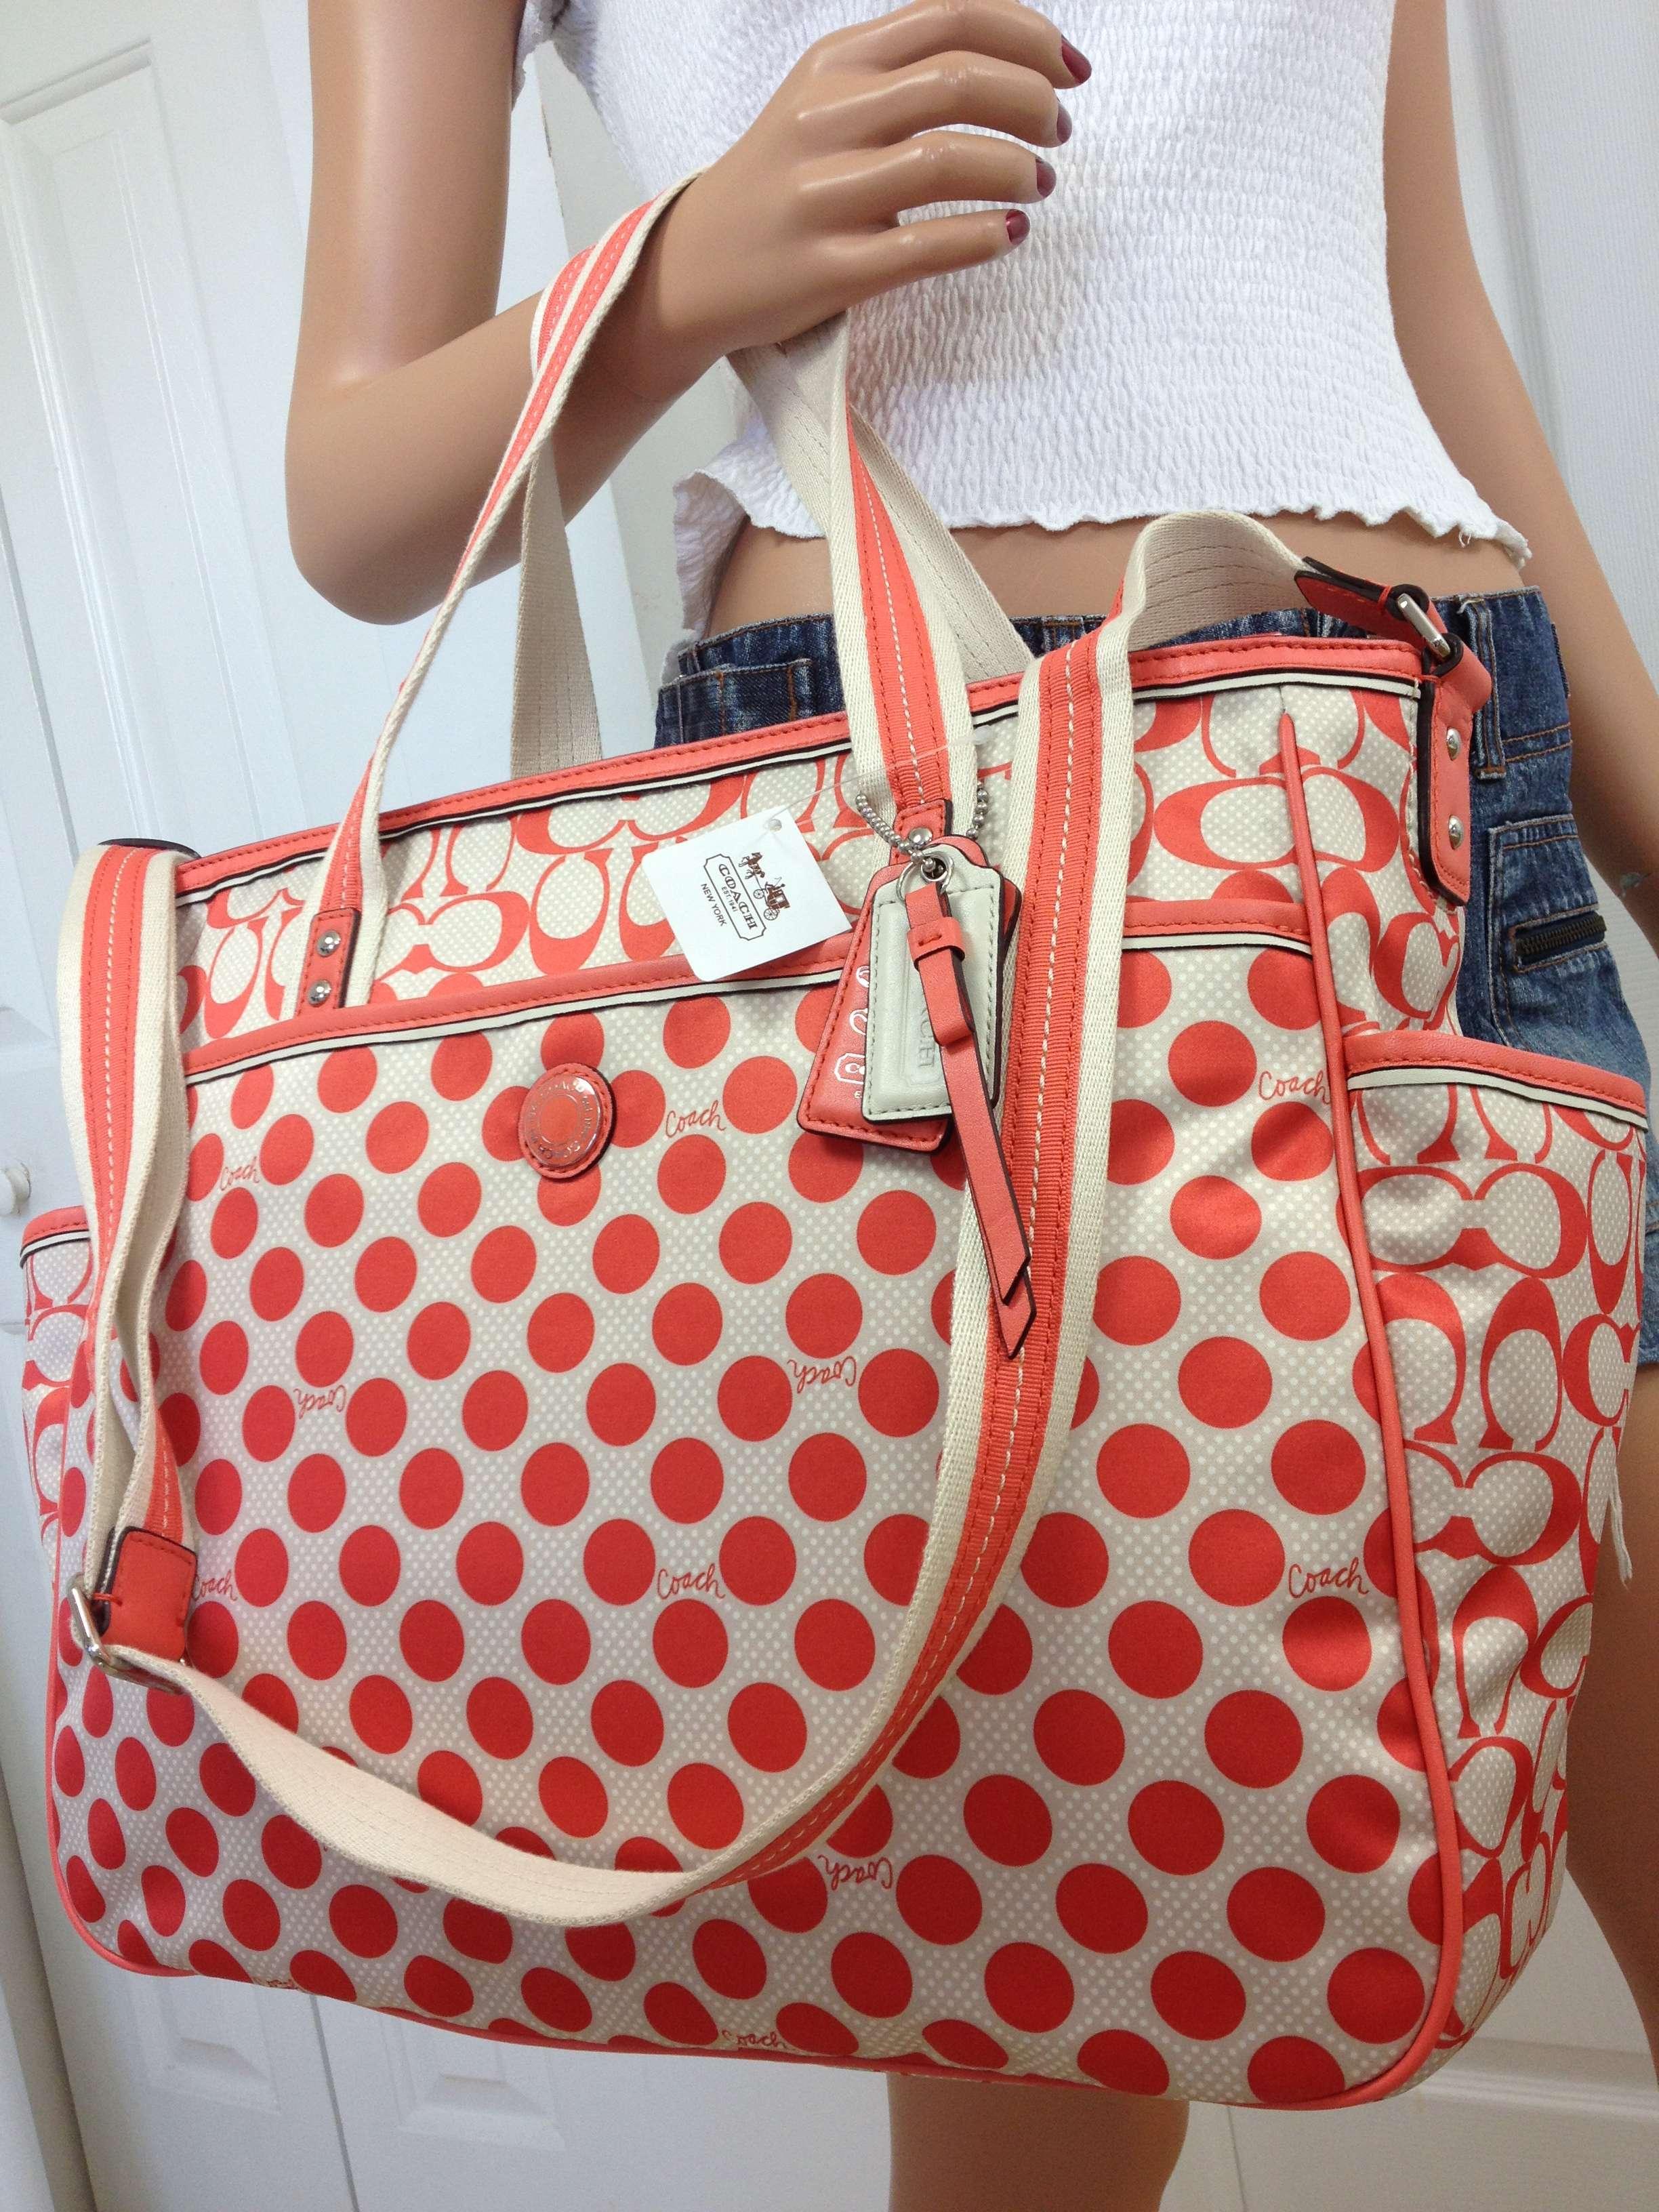 coach diaper bag outlet  handbags & bags diaper